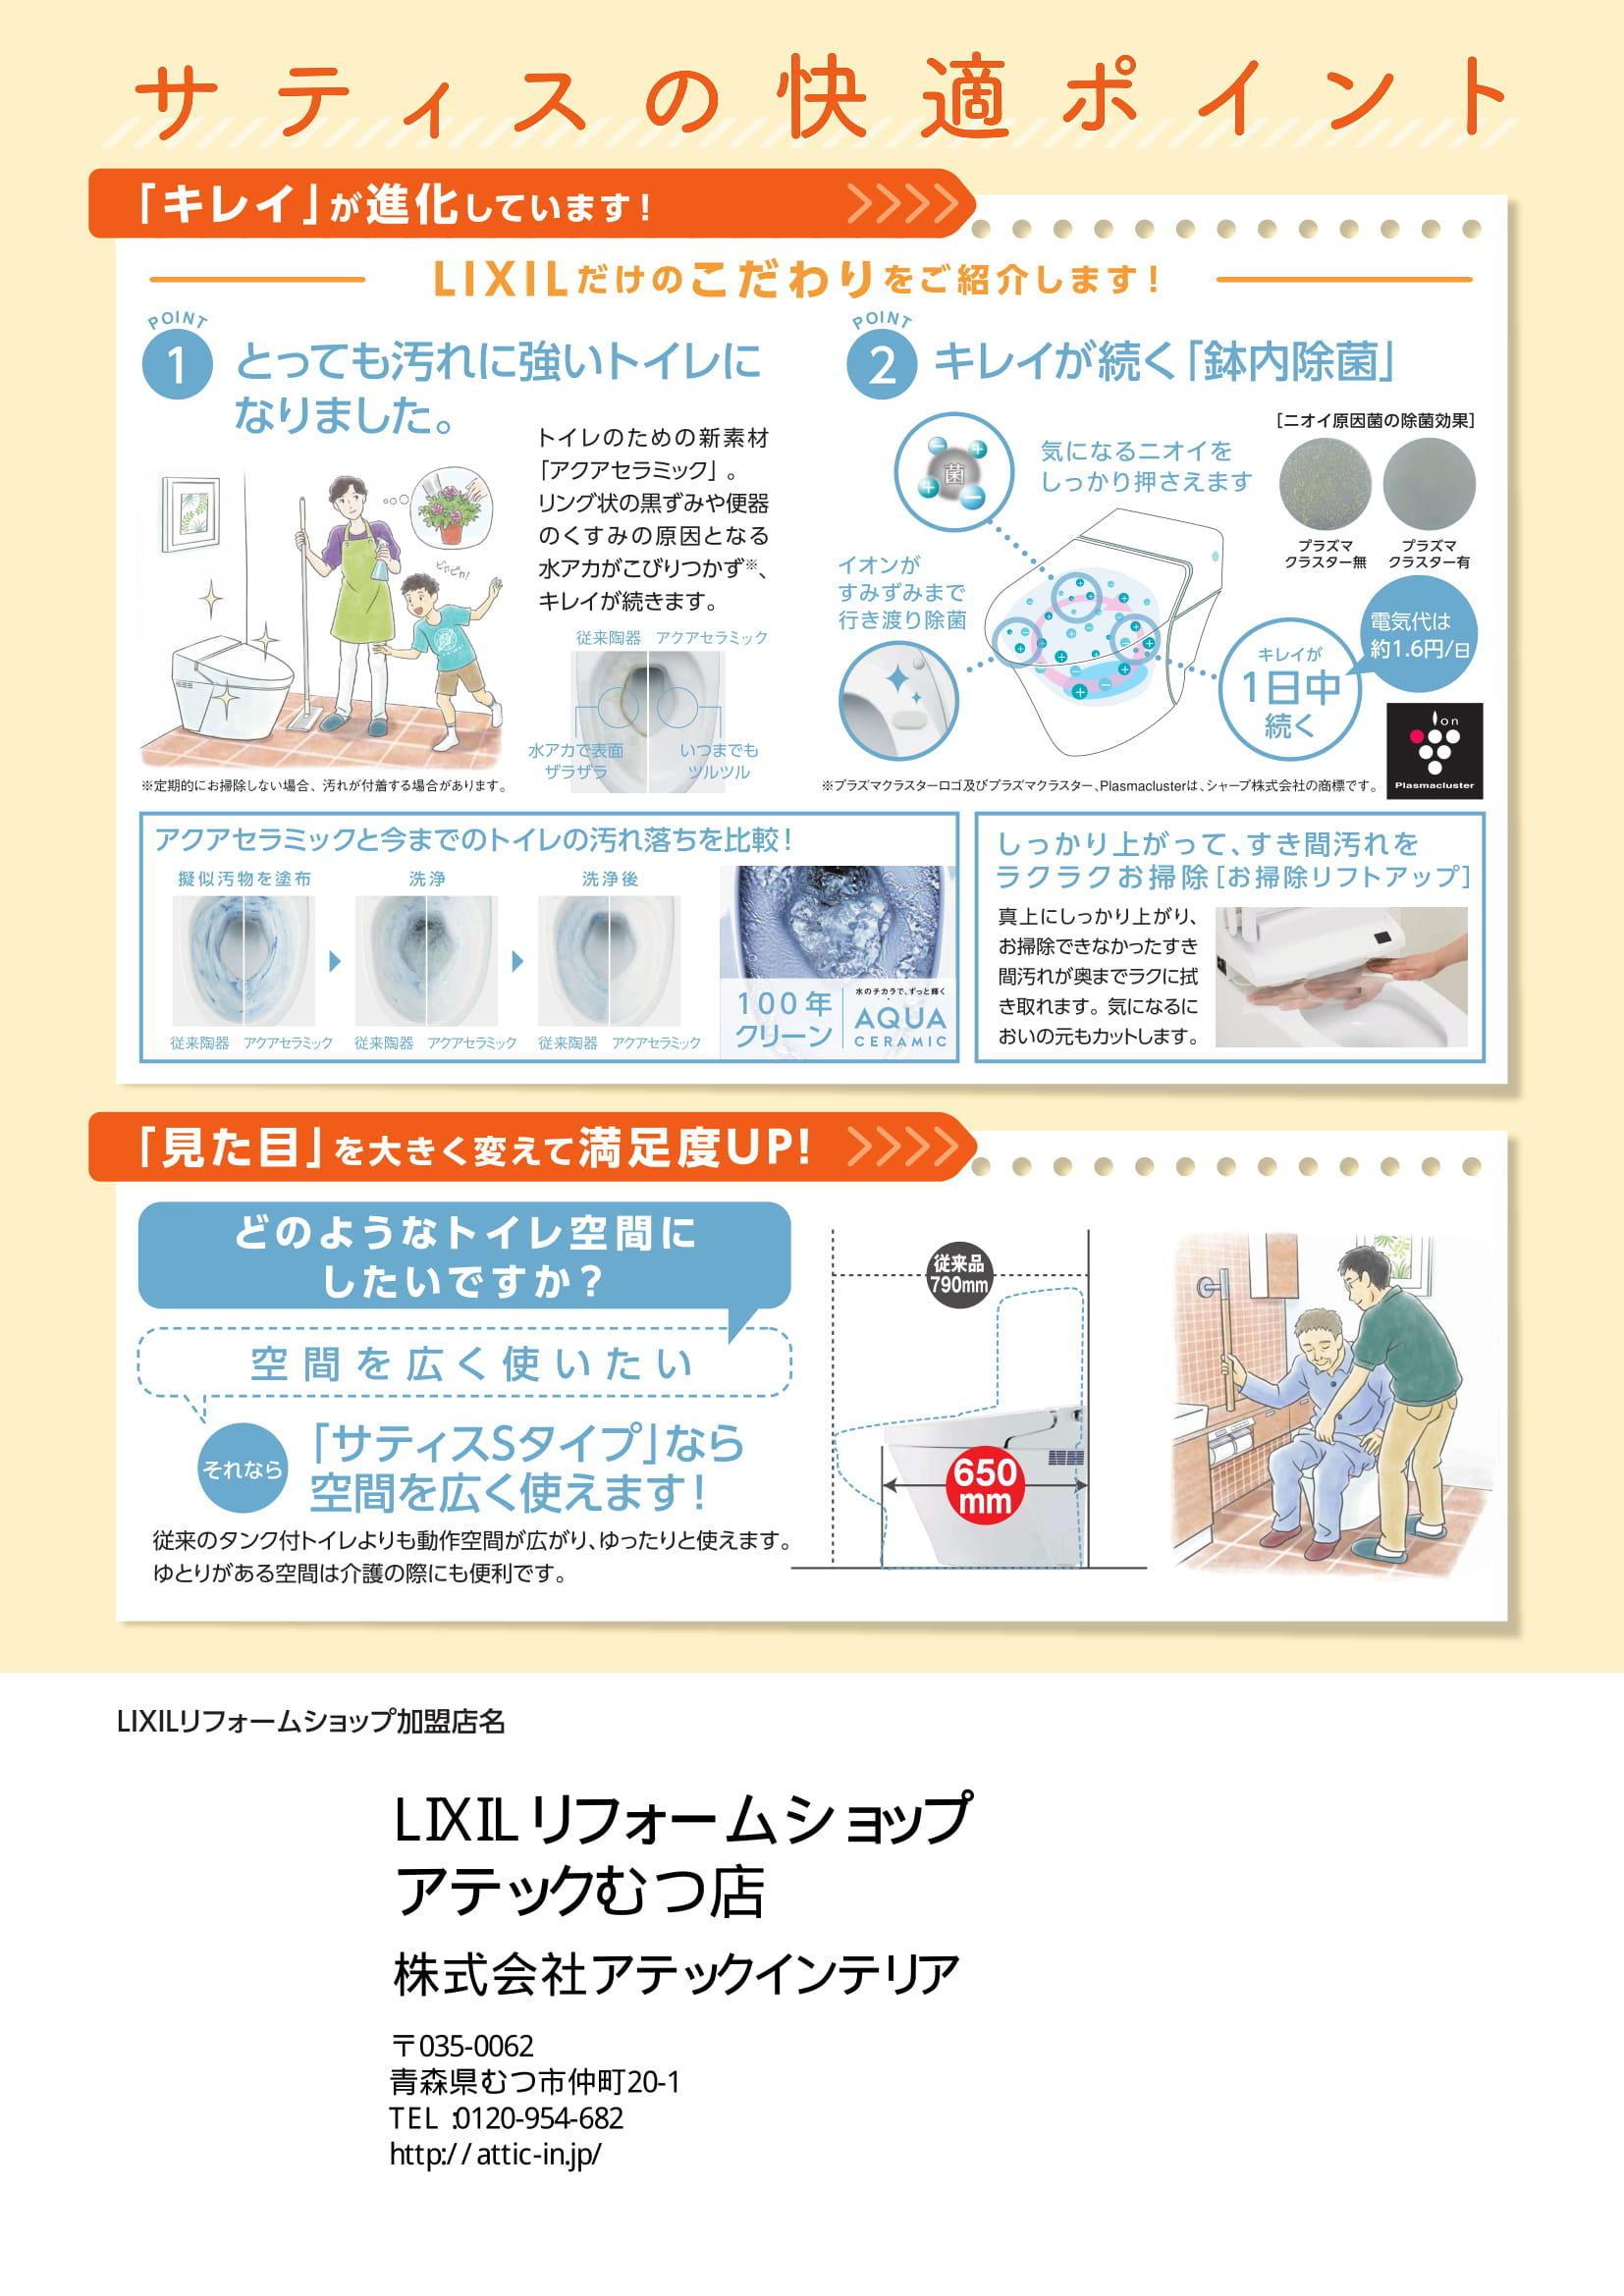 https://lixil-reformshop.jp/shop/SC00021006/photos/satisCP_RS_t-2.jpg